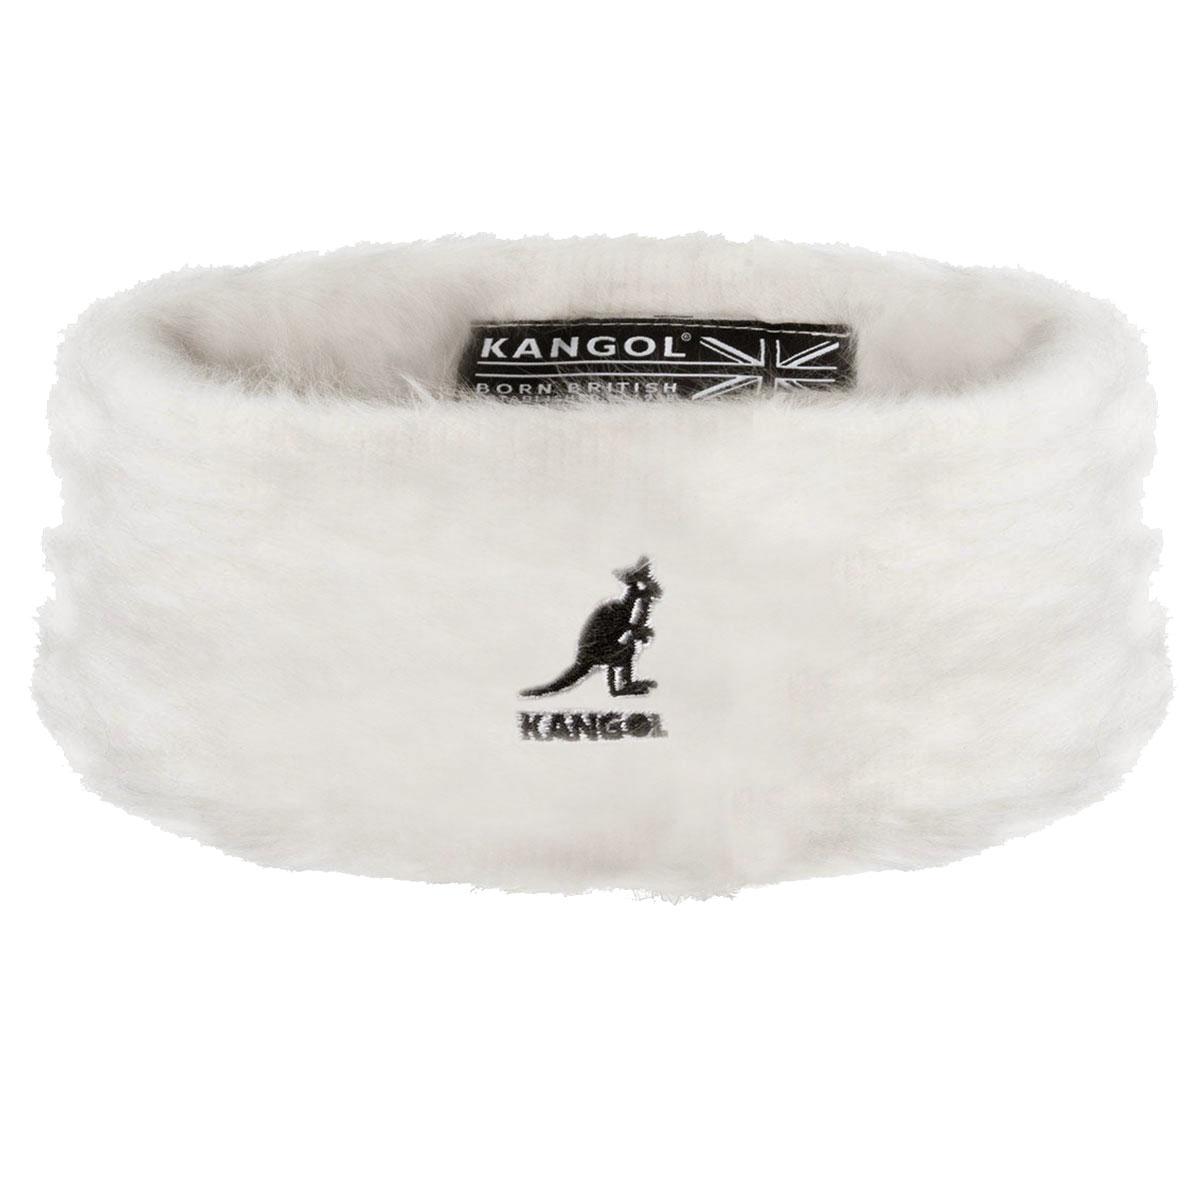 Kangol Furgora Headband in Cream